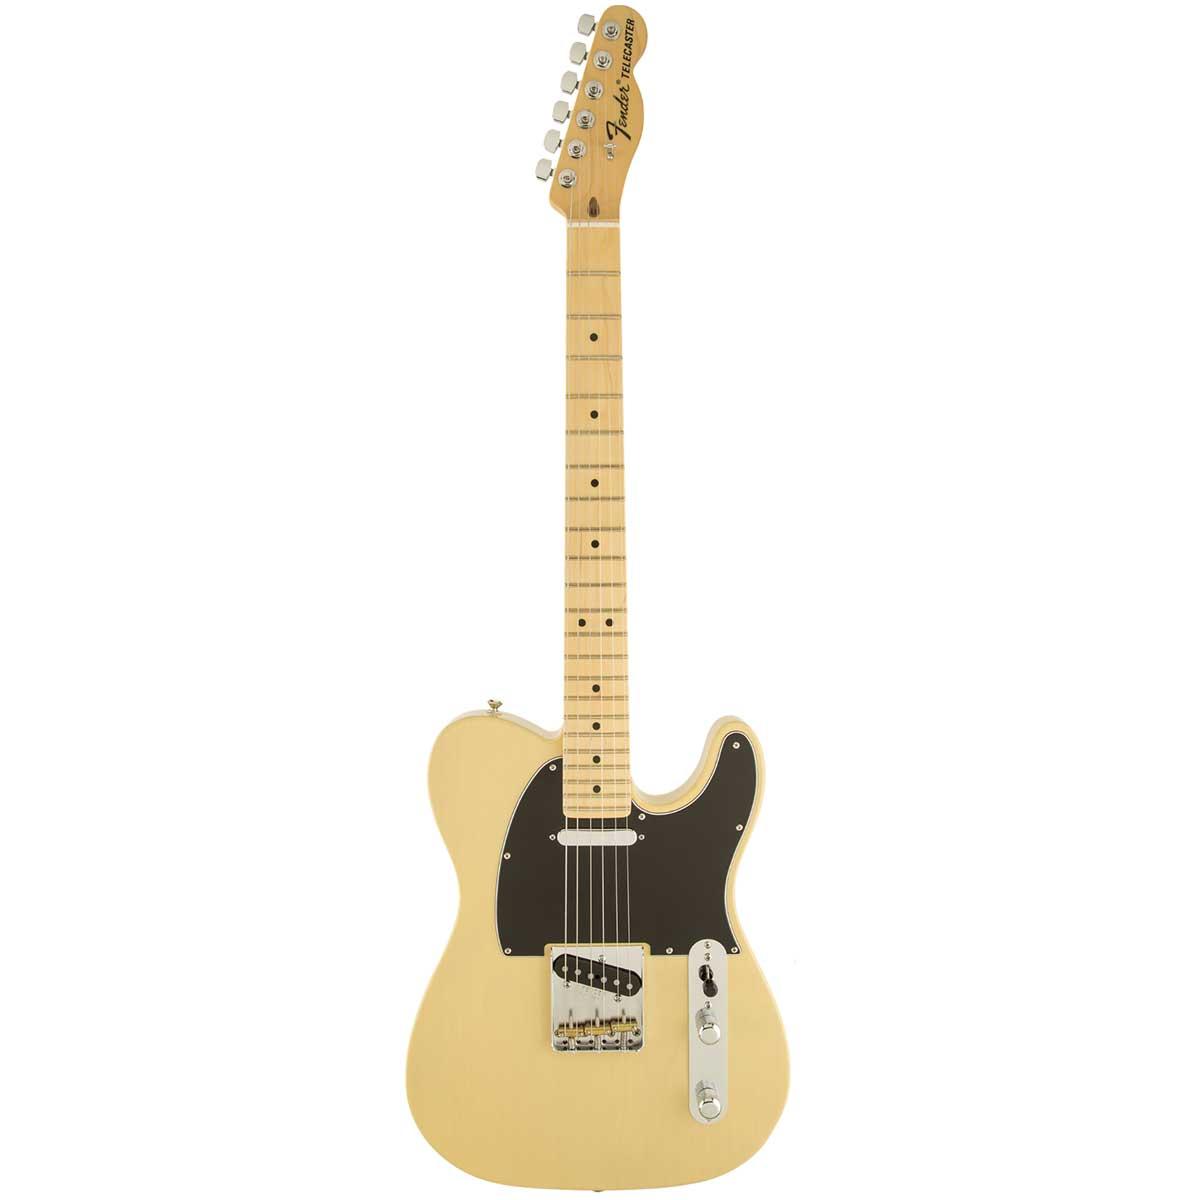 Fender AmericanSpecialTelecaster,MN,VBL el-guitar vintageblonde